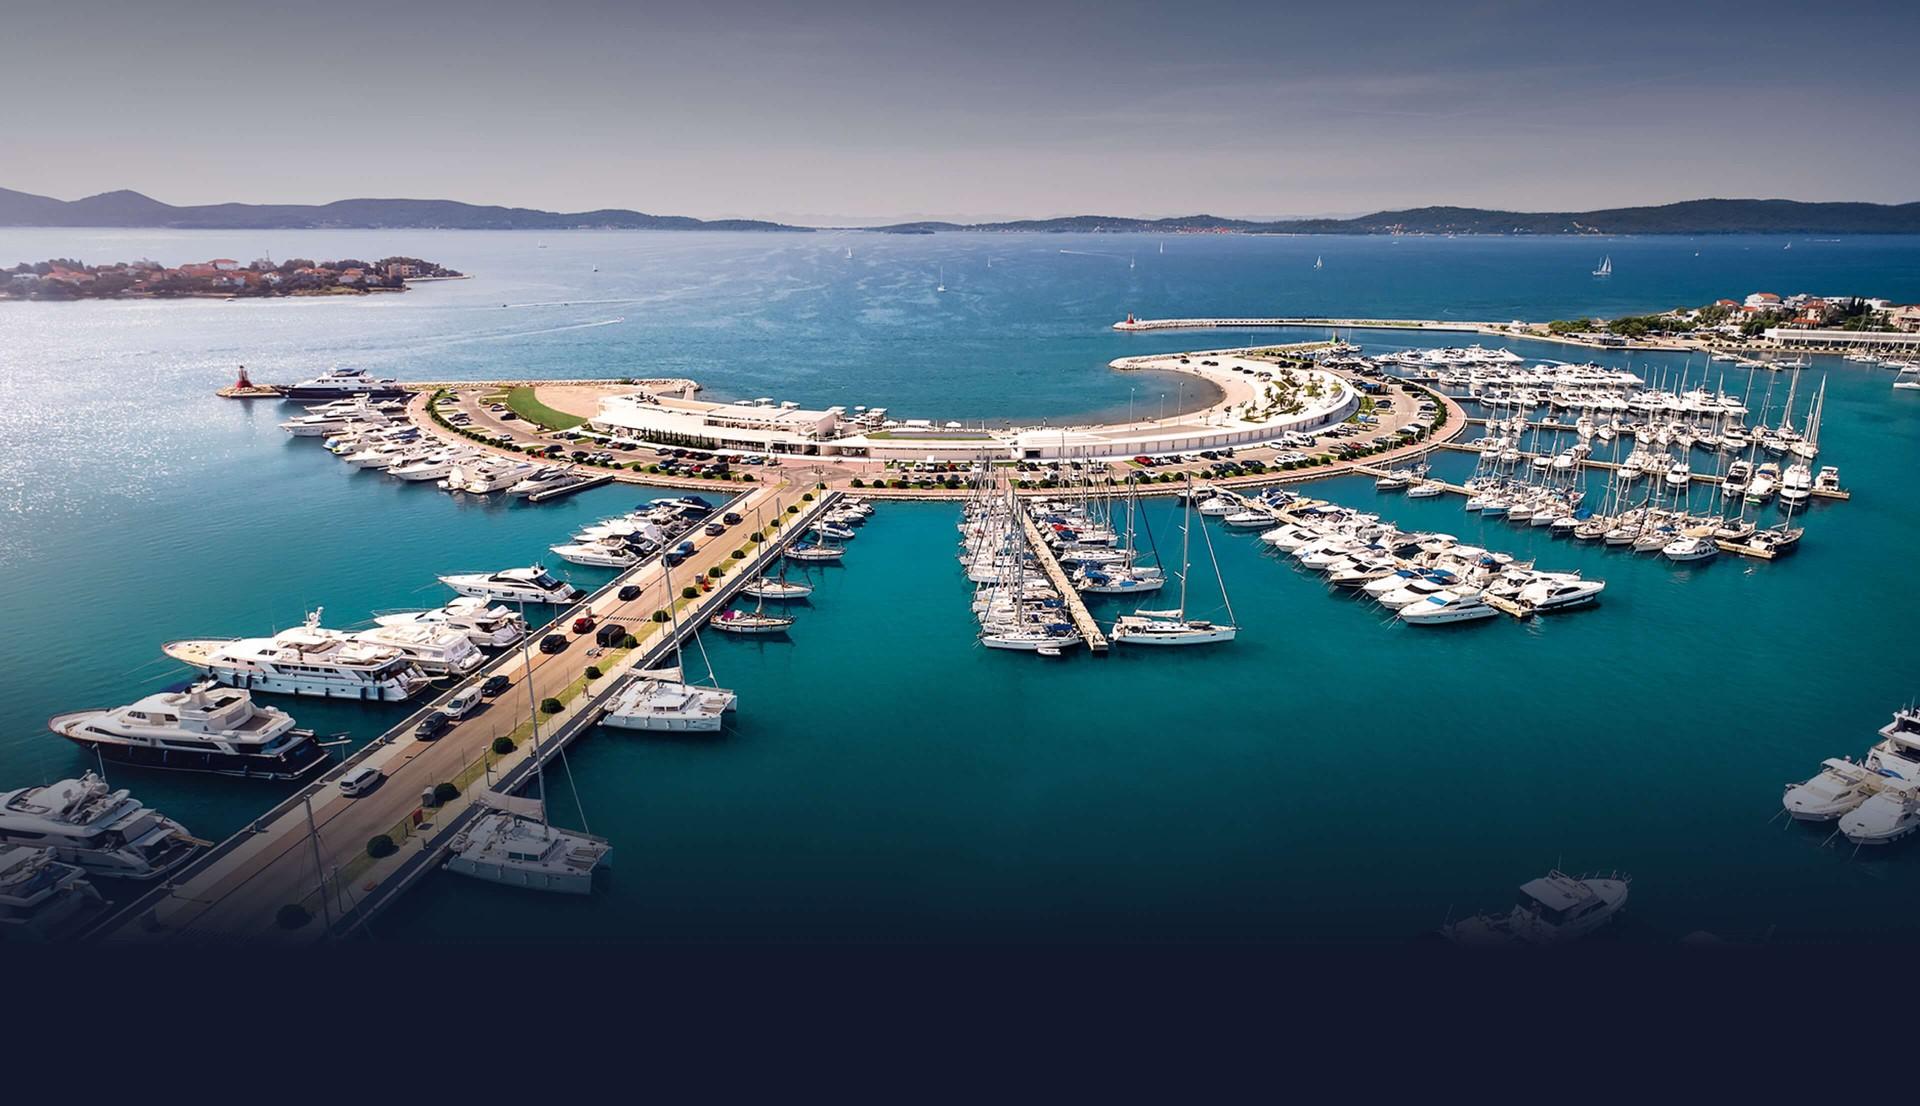 Marina Dalmacija: the largest marina in Croatia | D-Marin